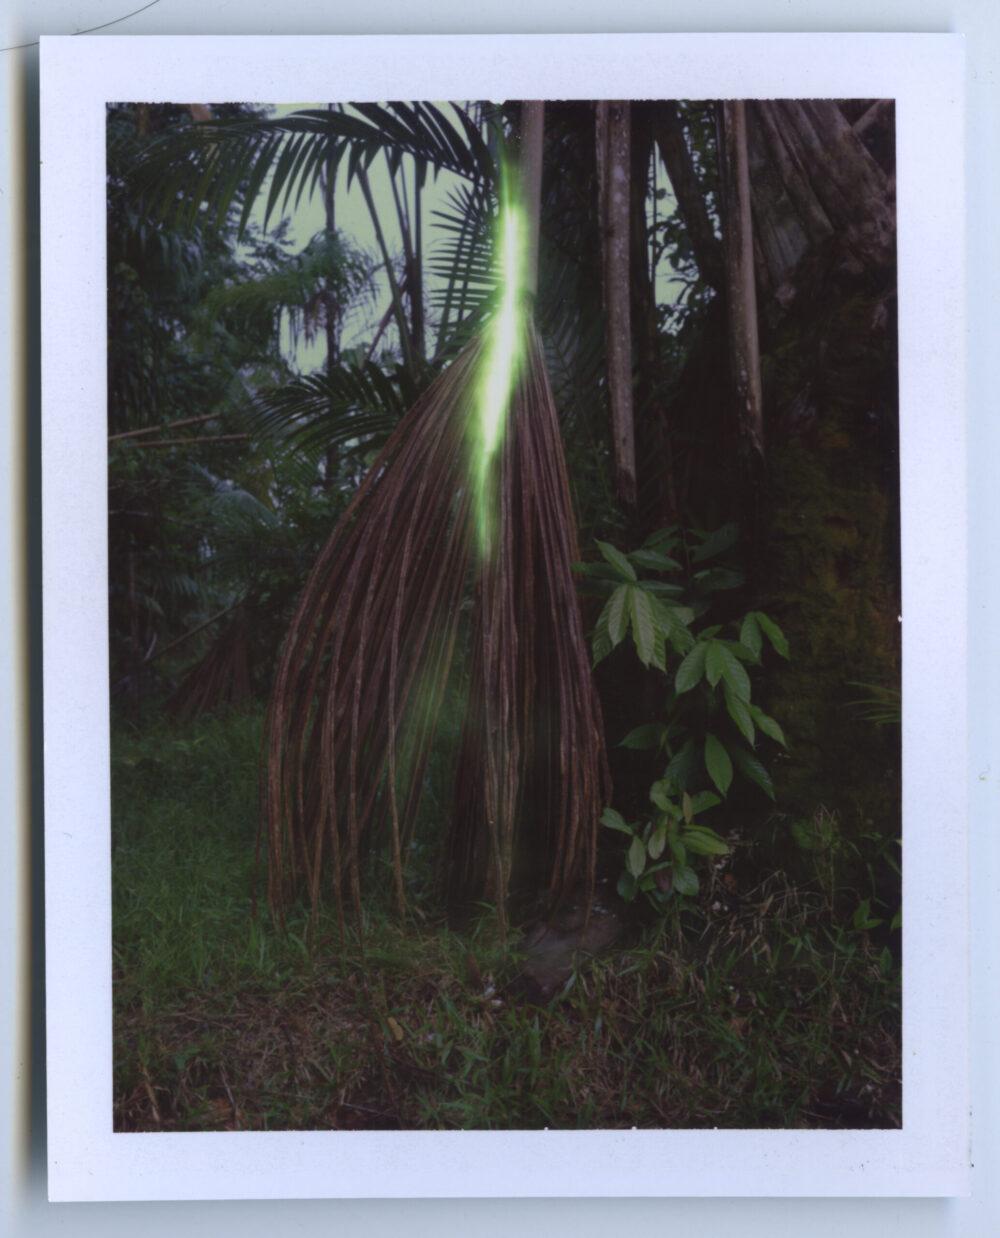 Amazonie Palm tree Karen Paulina Biswell Polaroid wildpalms Colombia photography latinamerican female artist